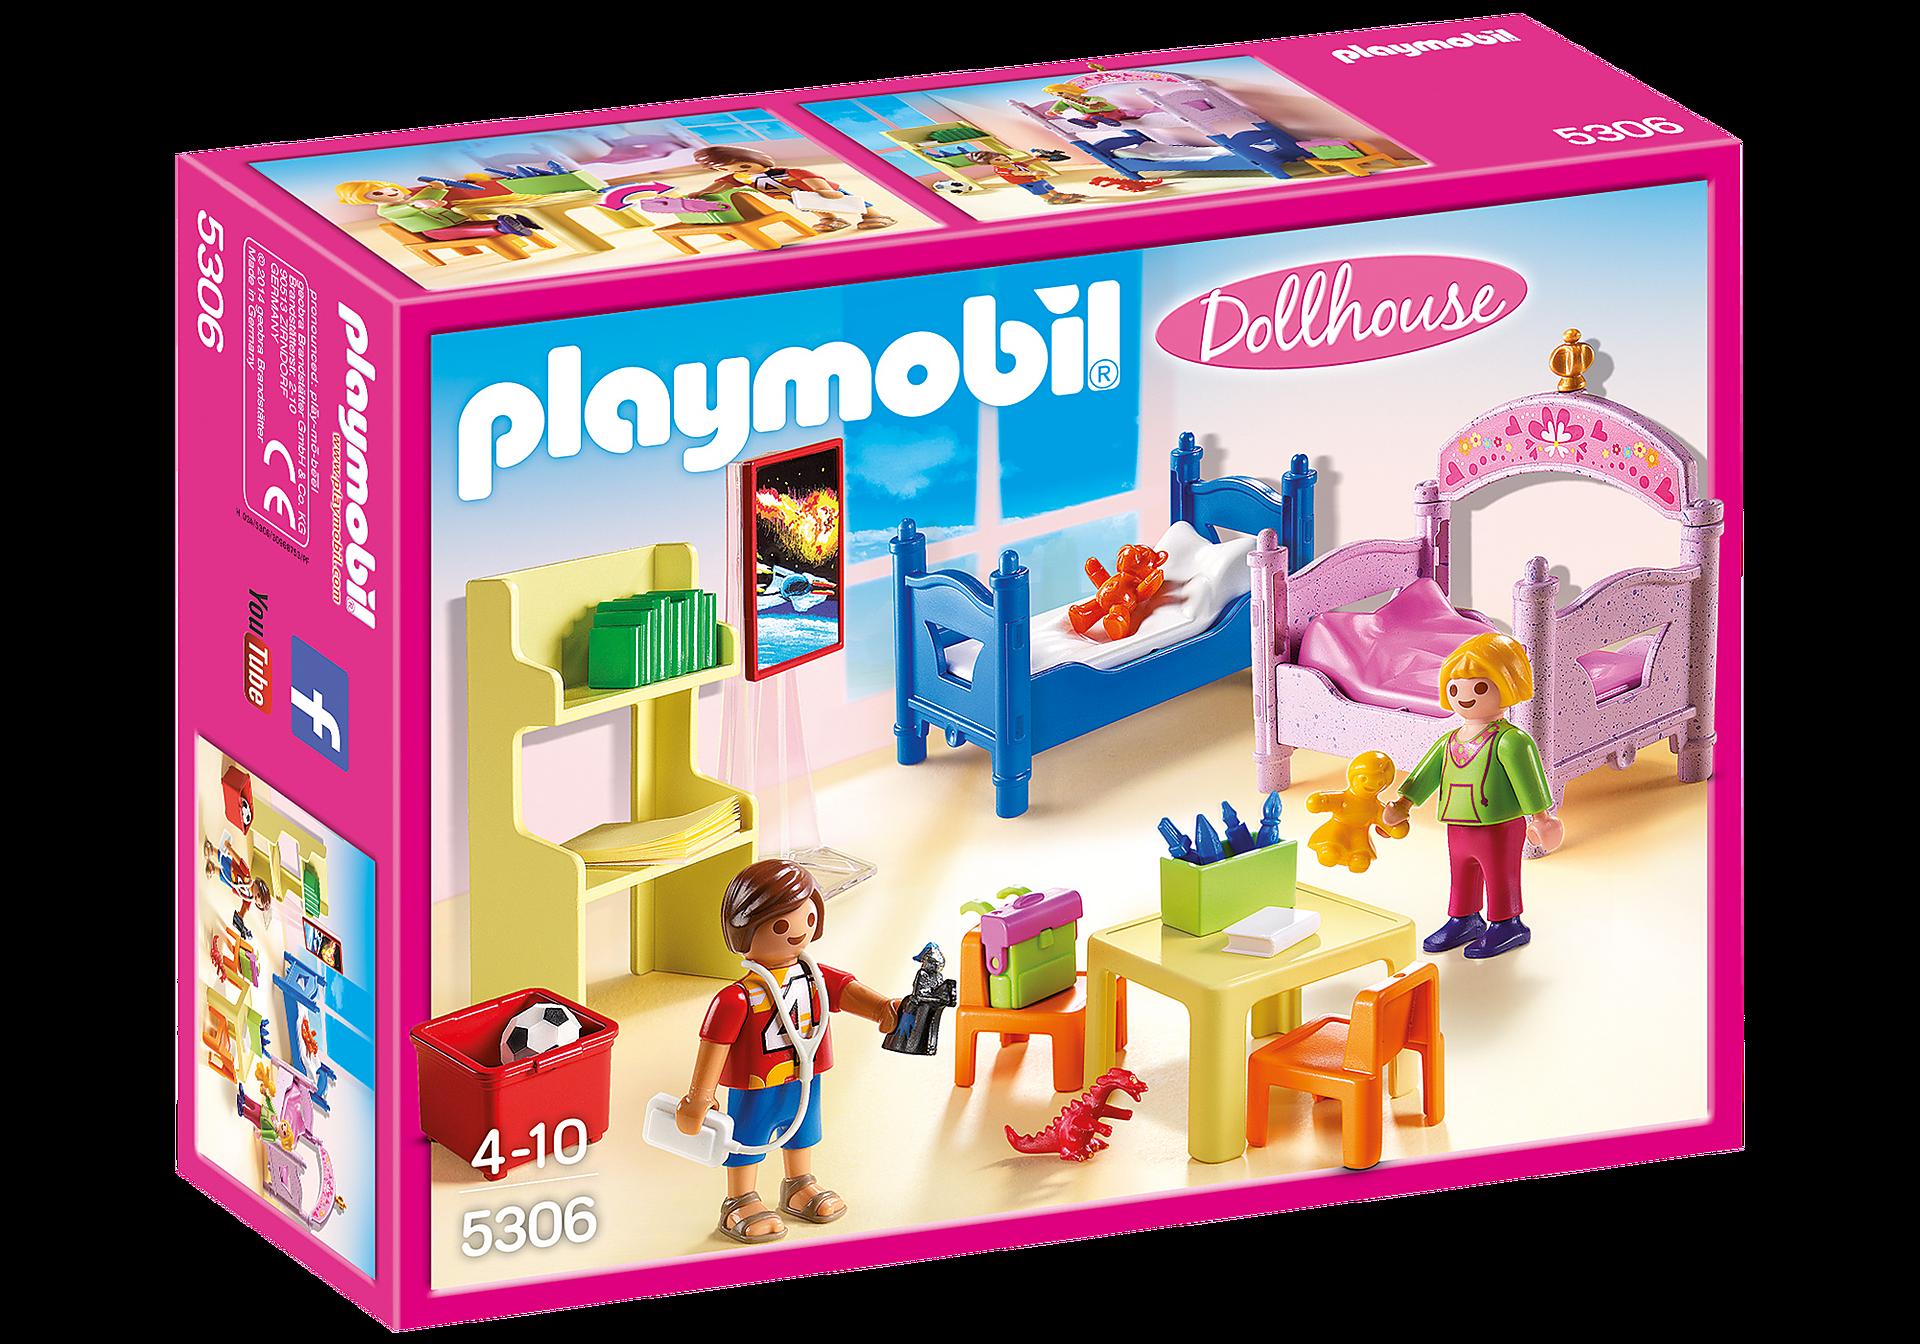 http://media.playmobil.com/i/playmobil/5306_product_box_front/Children's Room